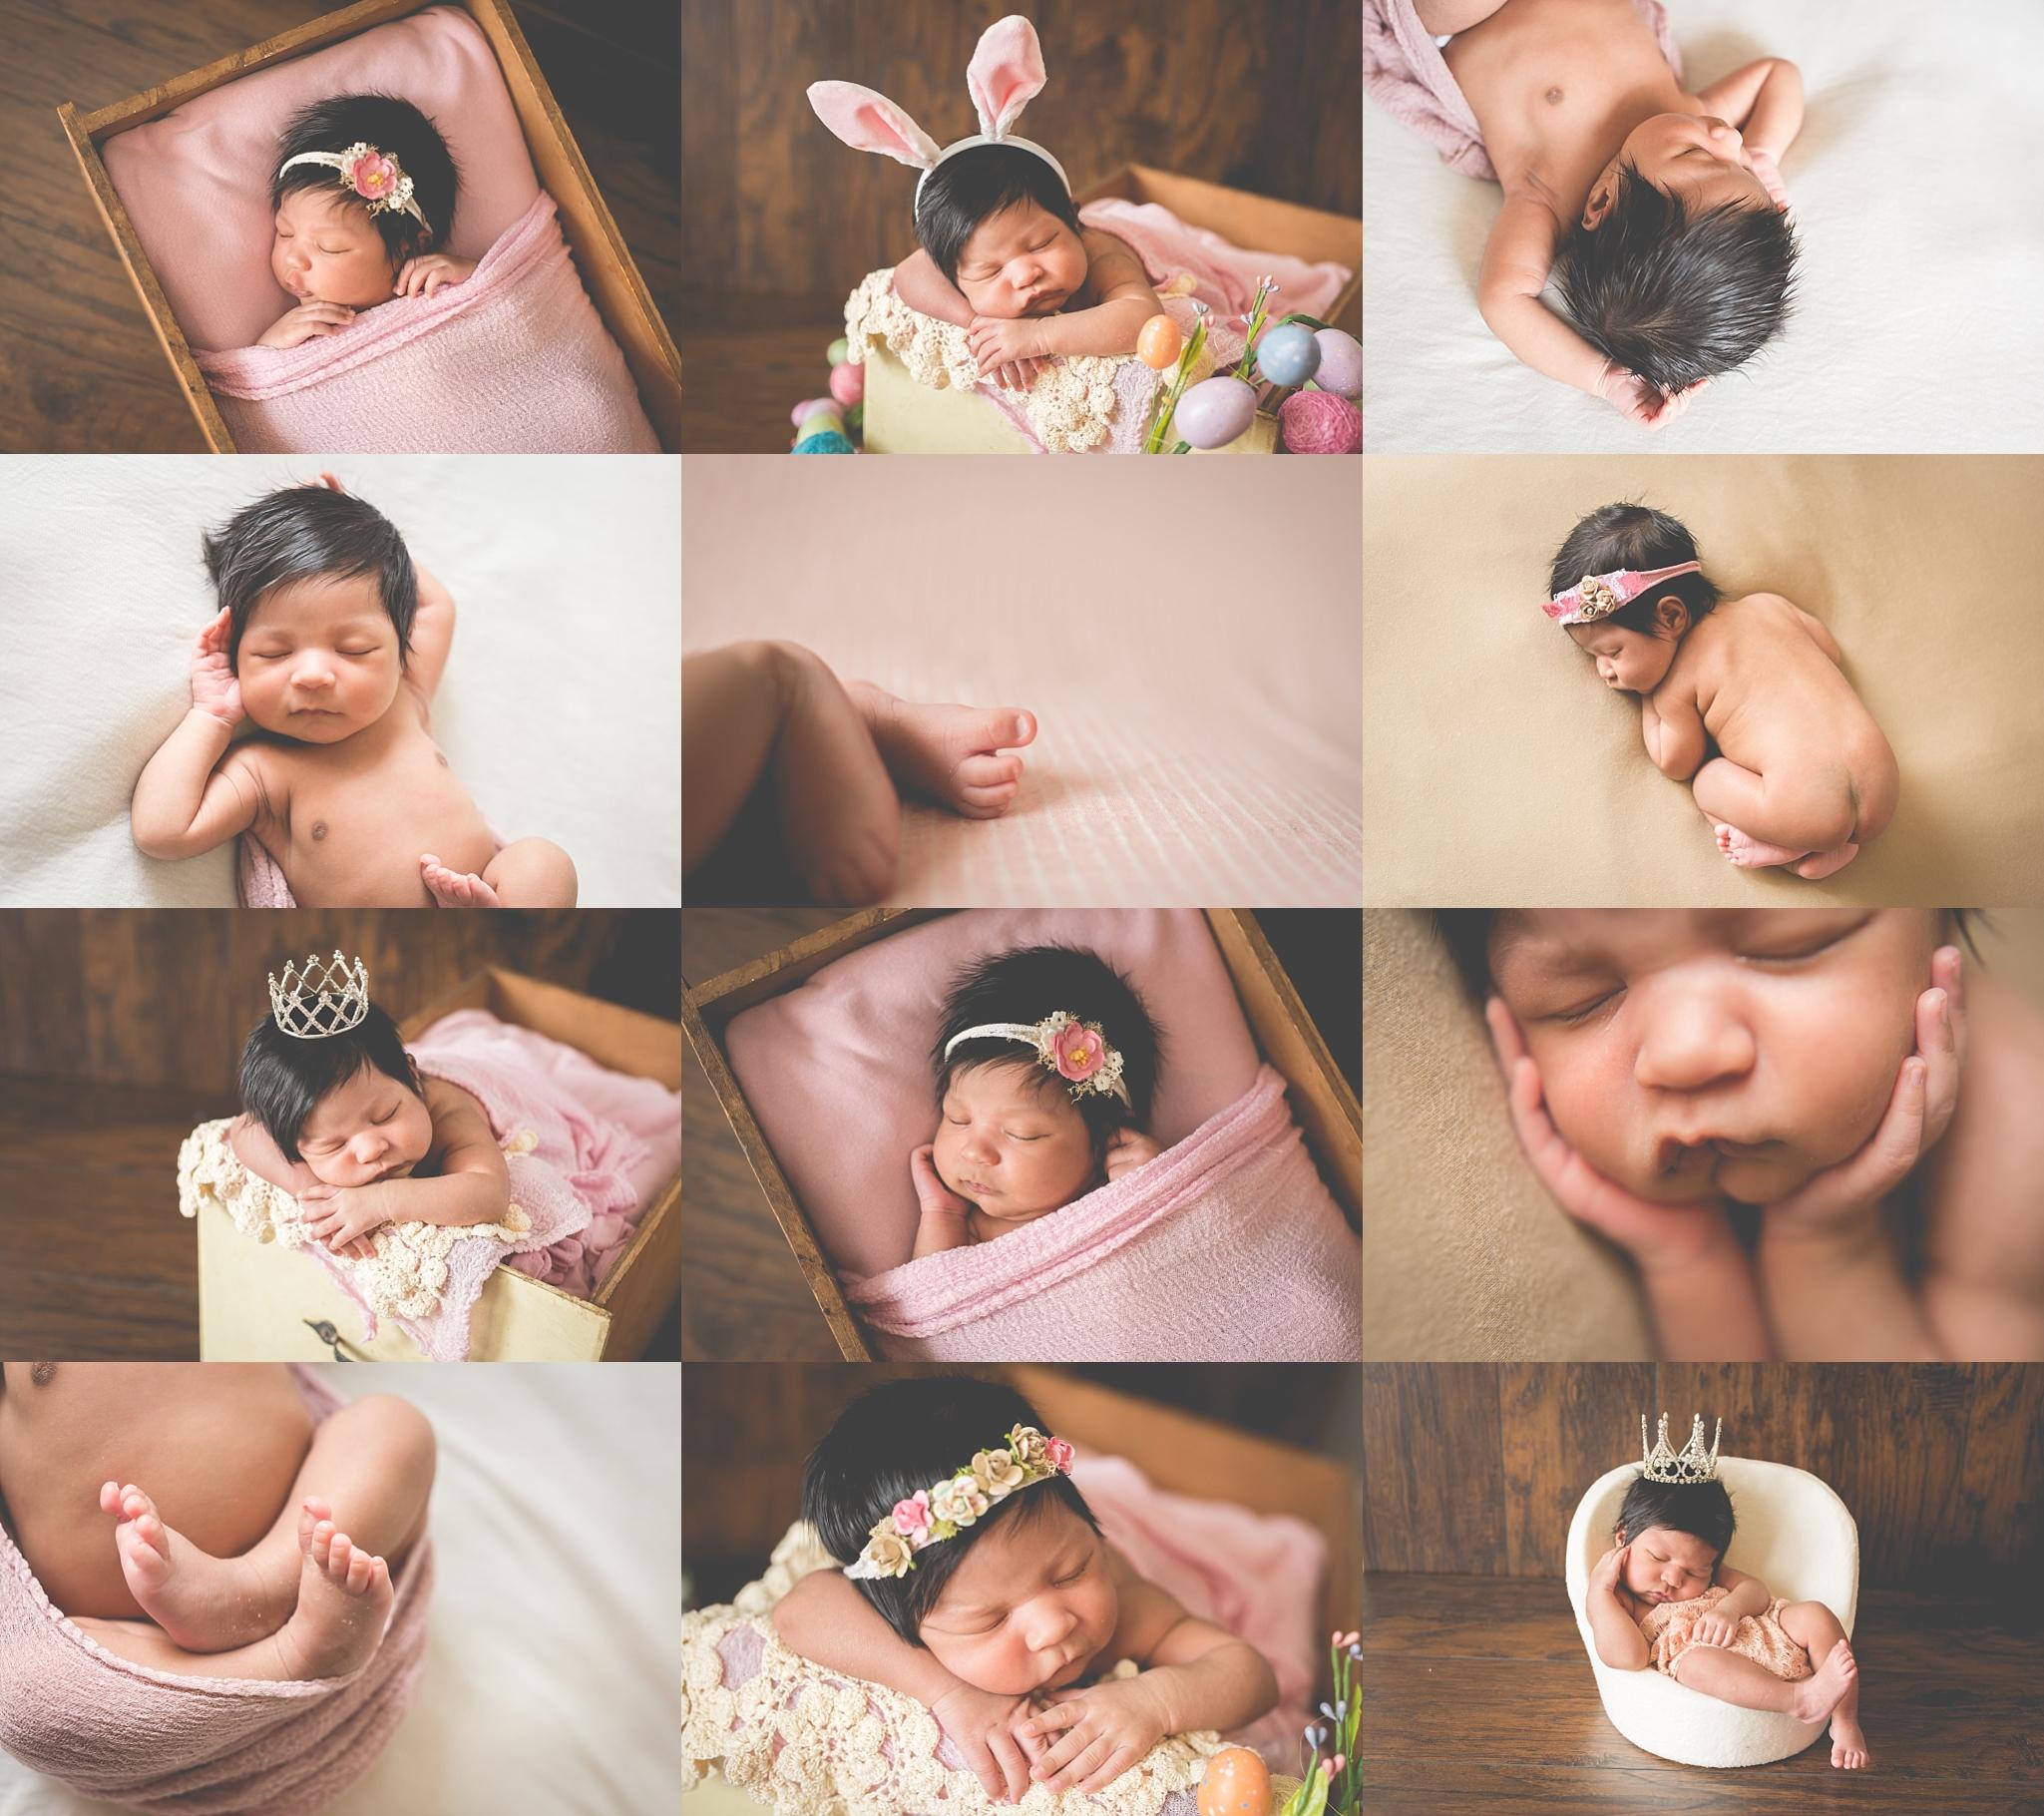 pink-girl-photos-jefferson-city-columbia-como-missouri-studio-newborn-baby-easter.jpg